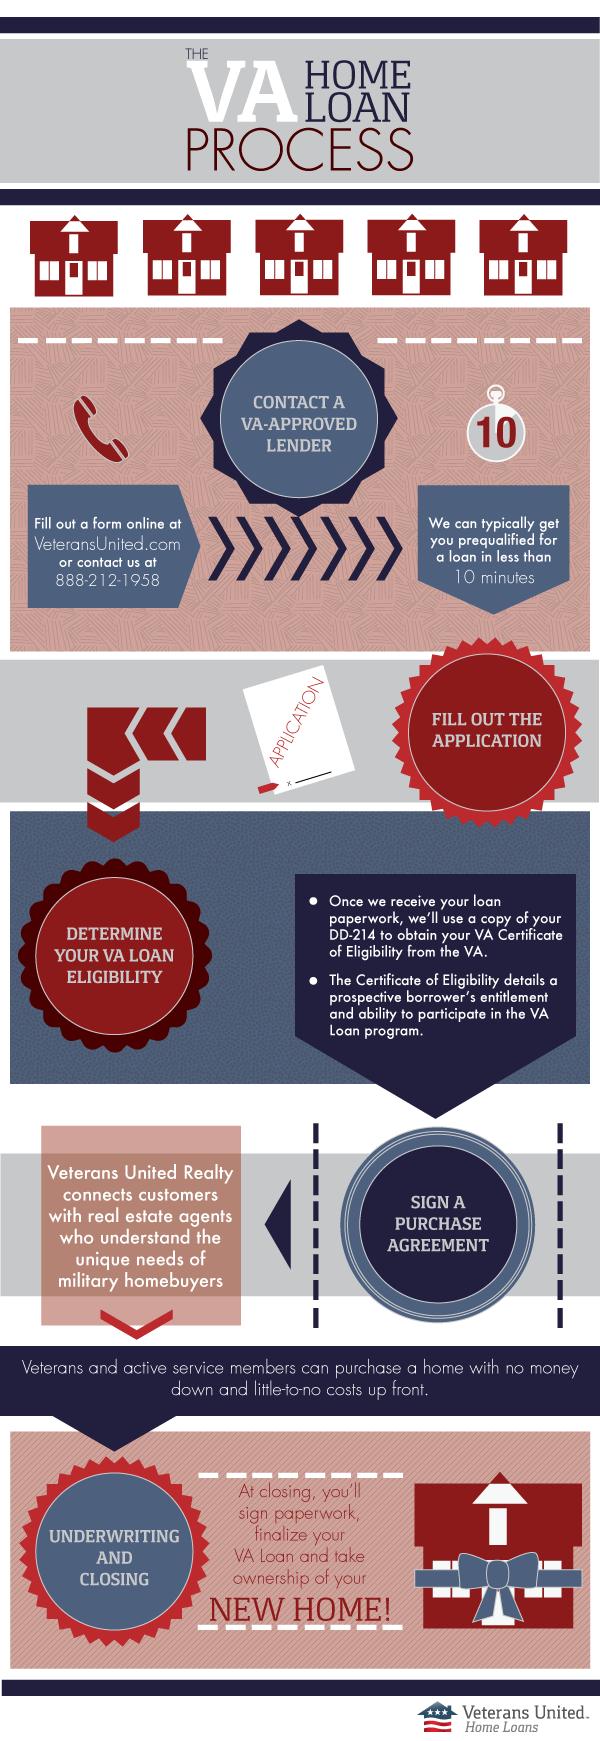 Steps Of The Va Loan Process Veterans United Home Loans Home Loans Va Loan Home Buying Process